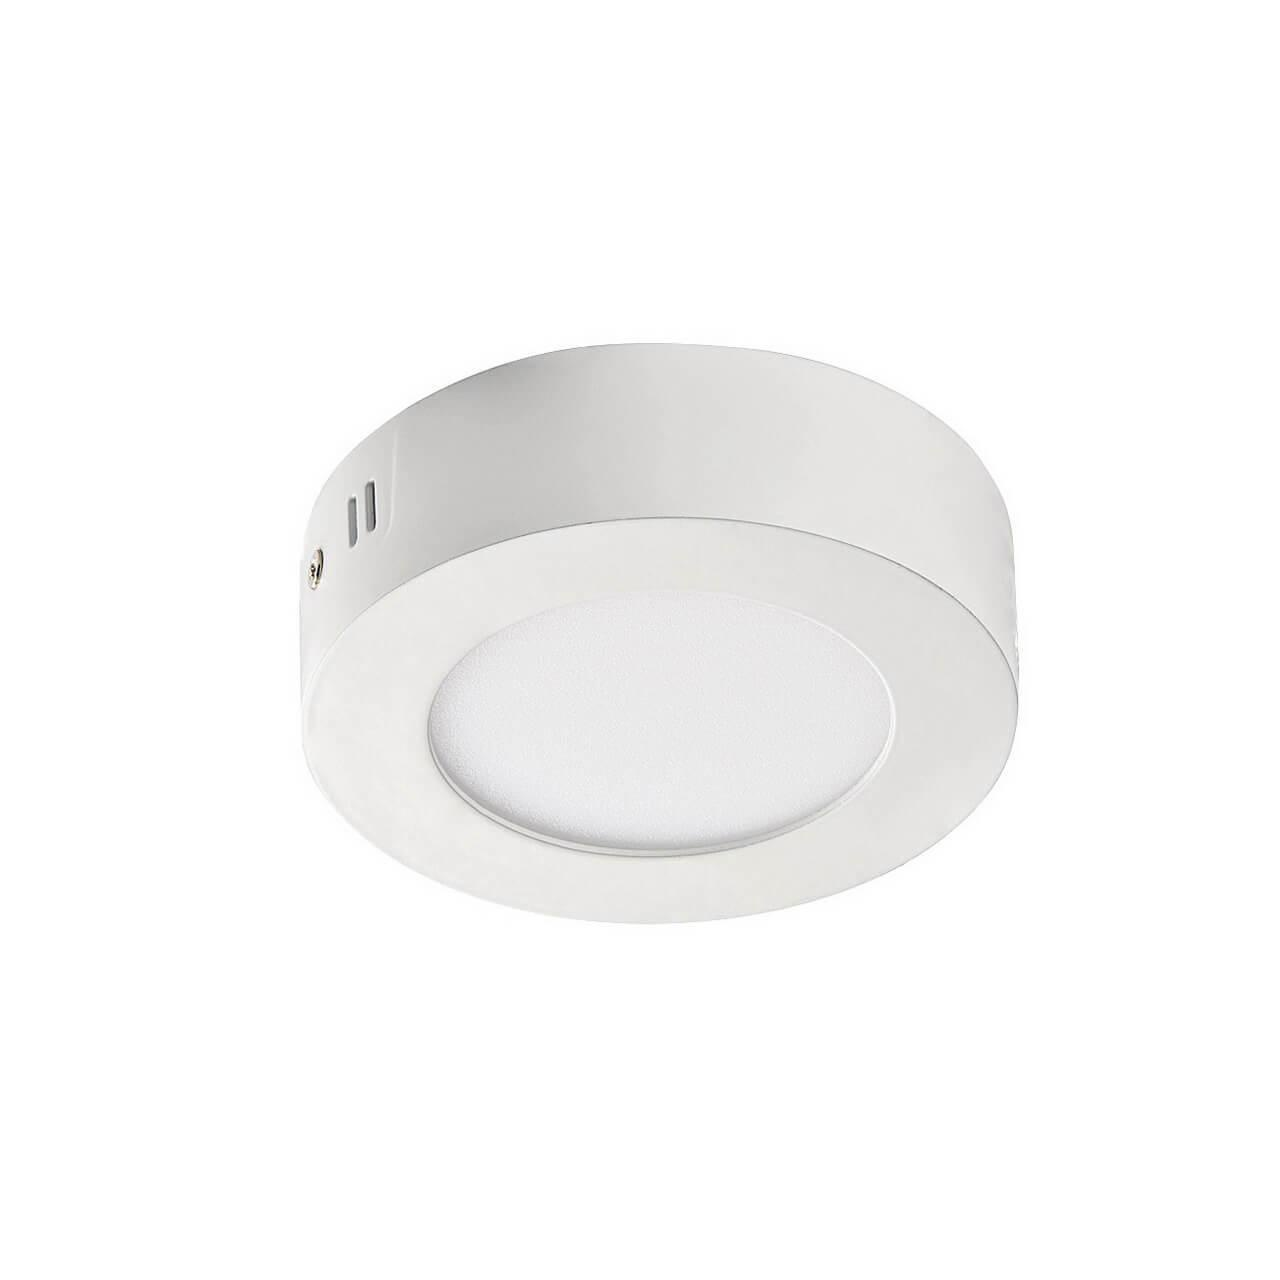 Накладной светильник Favourite 1347-6C, LED, 1 Вт цена